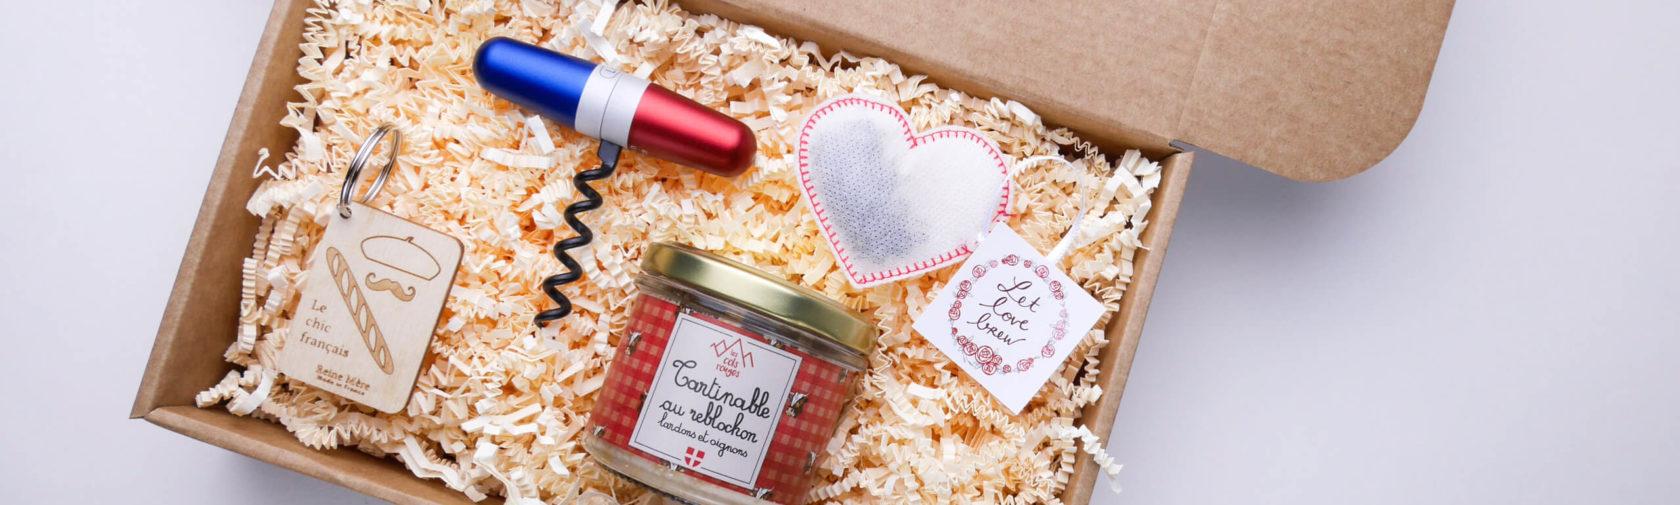 box-st-valentin-homme-1